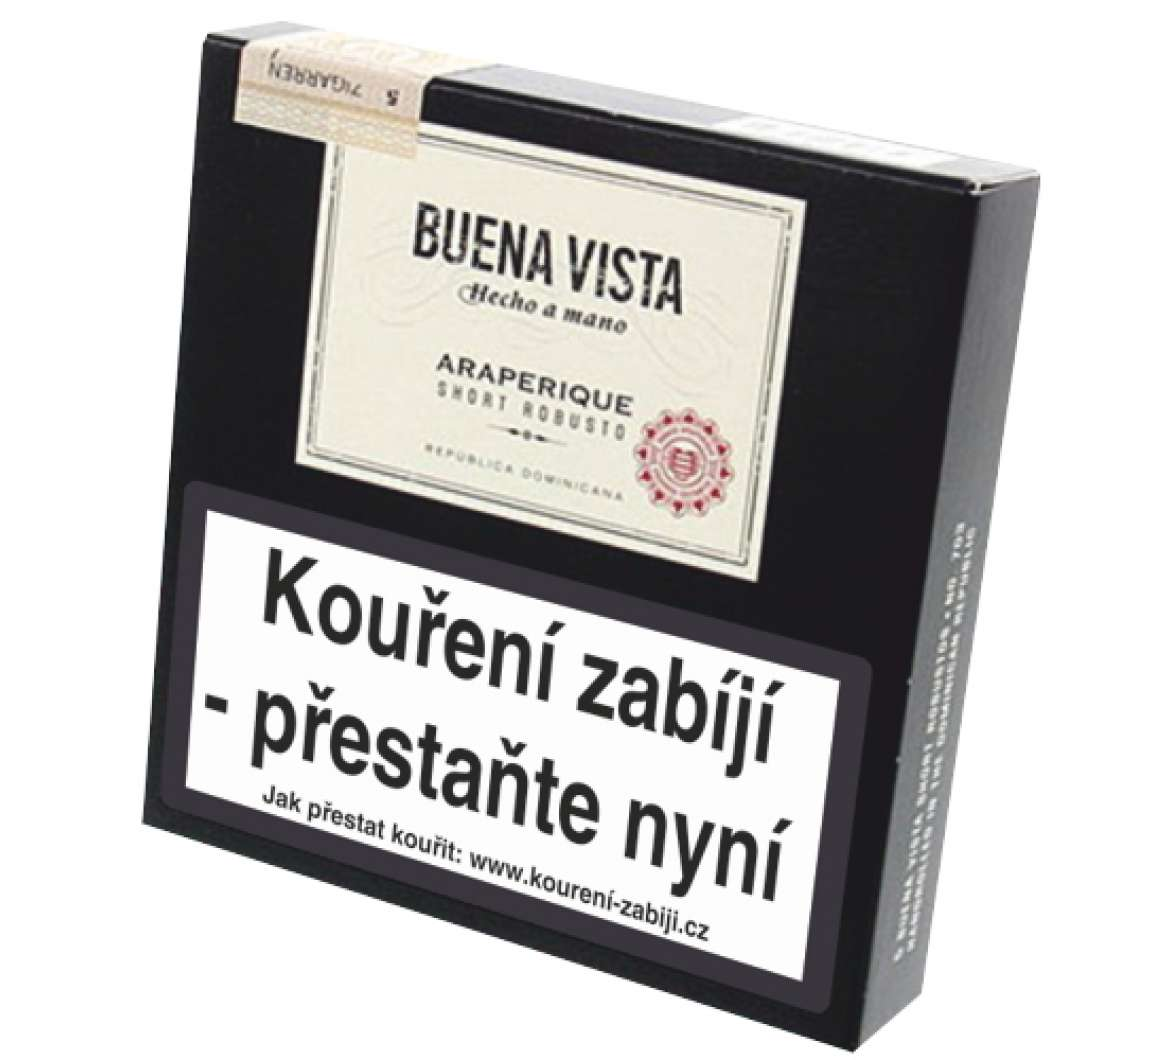 Buena Vista Toro Araperique 5ks